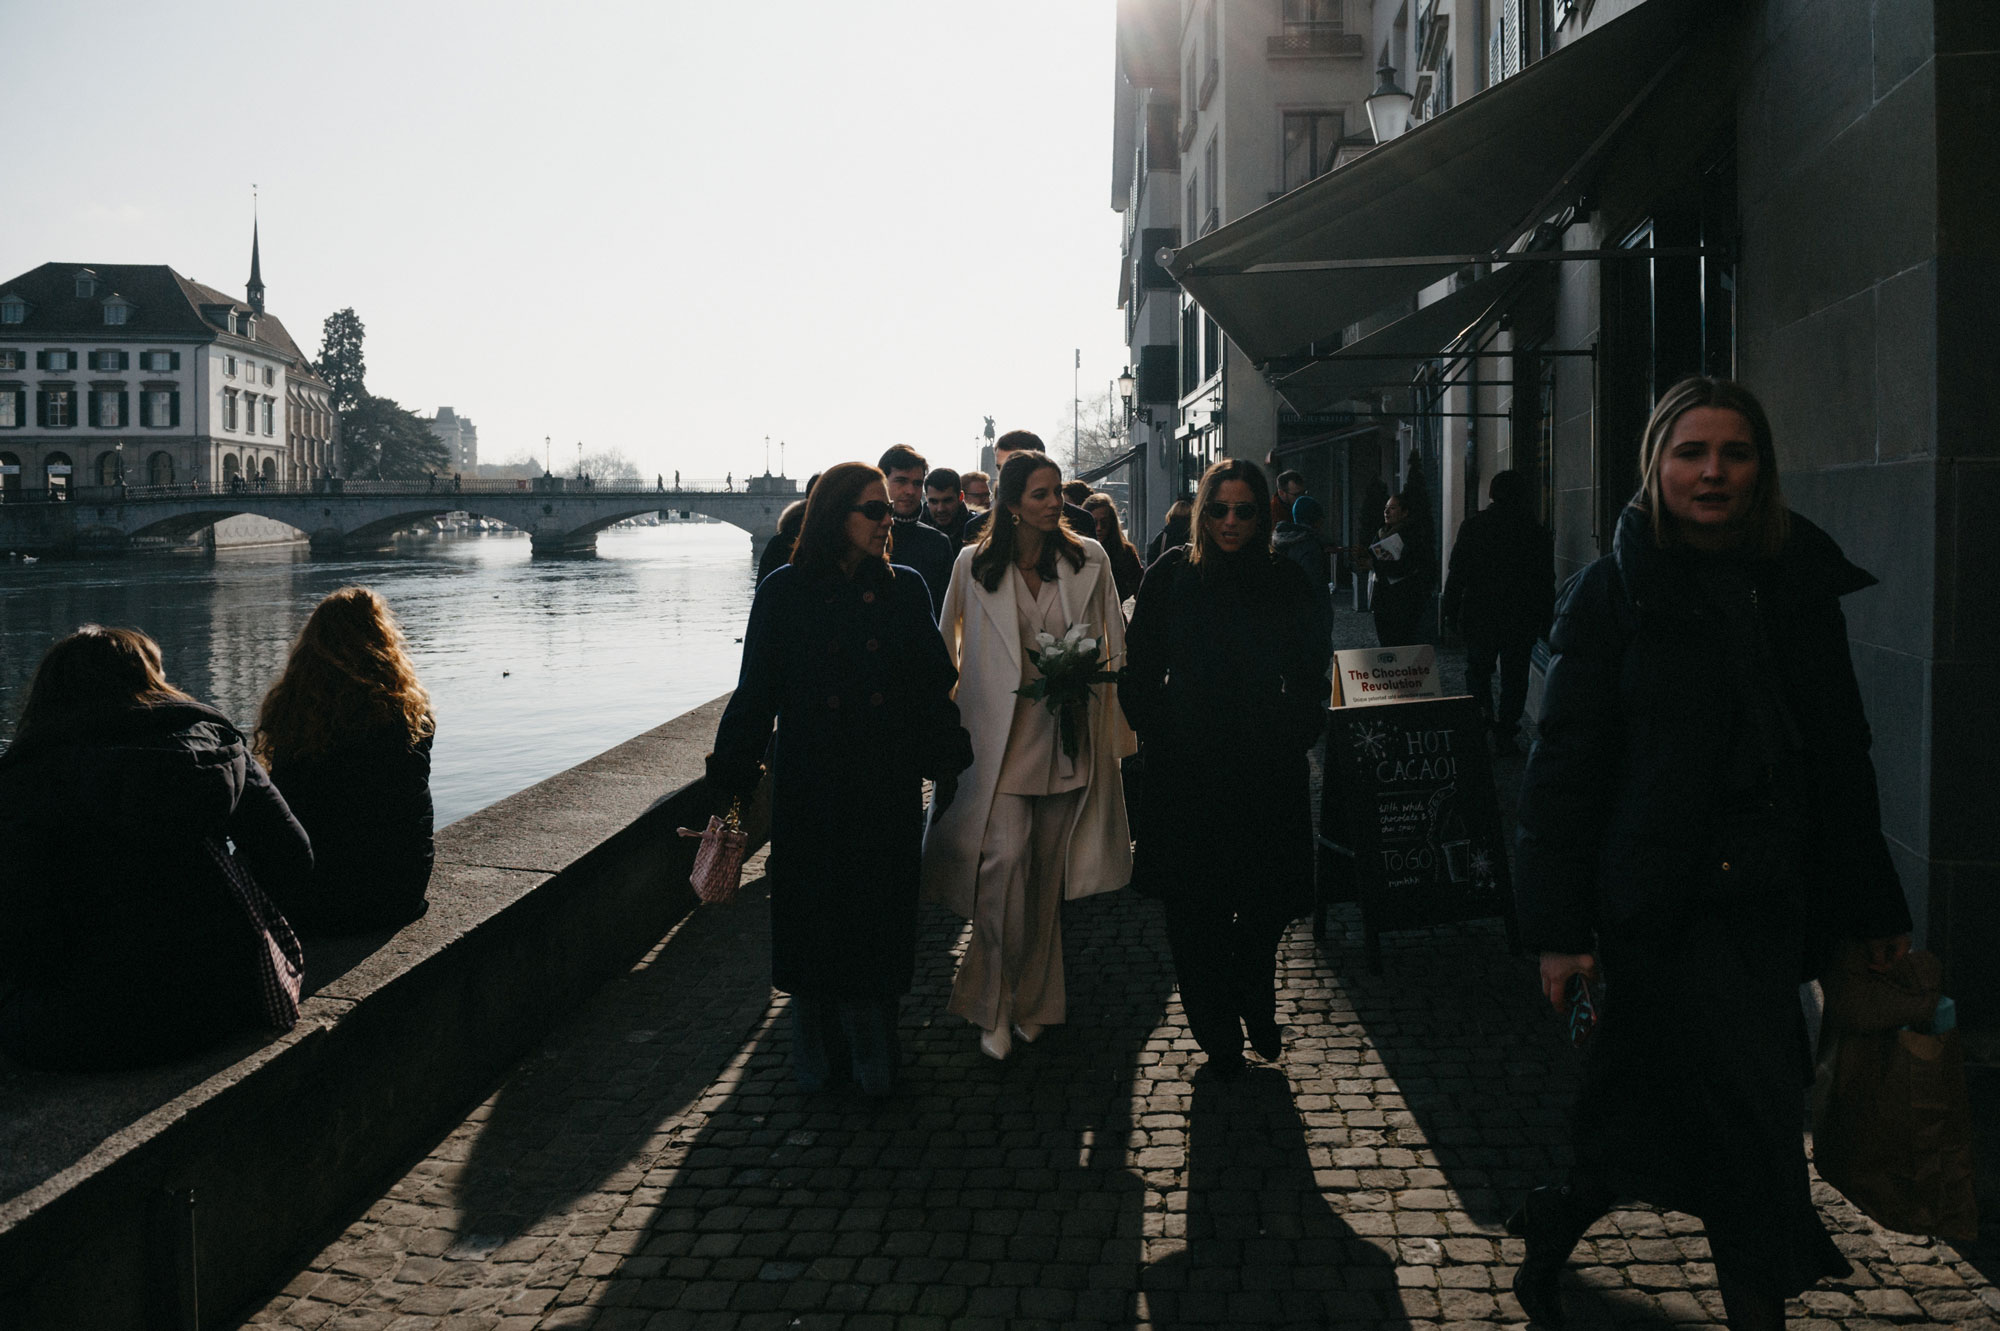 juliana-cosimo-stadthaus-wedding-143.jpg